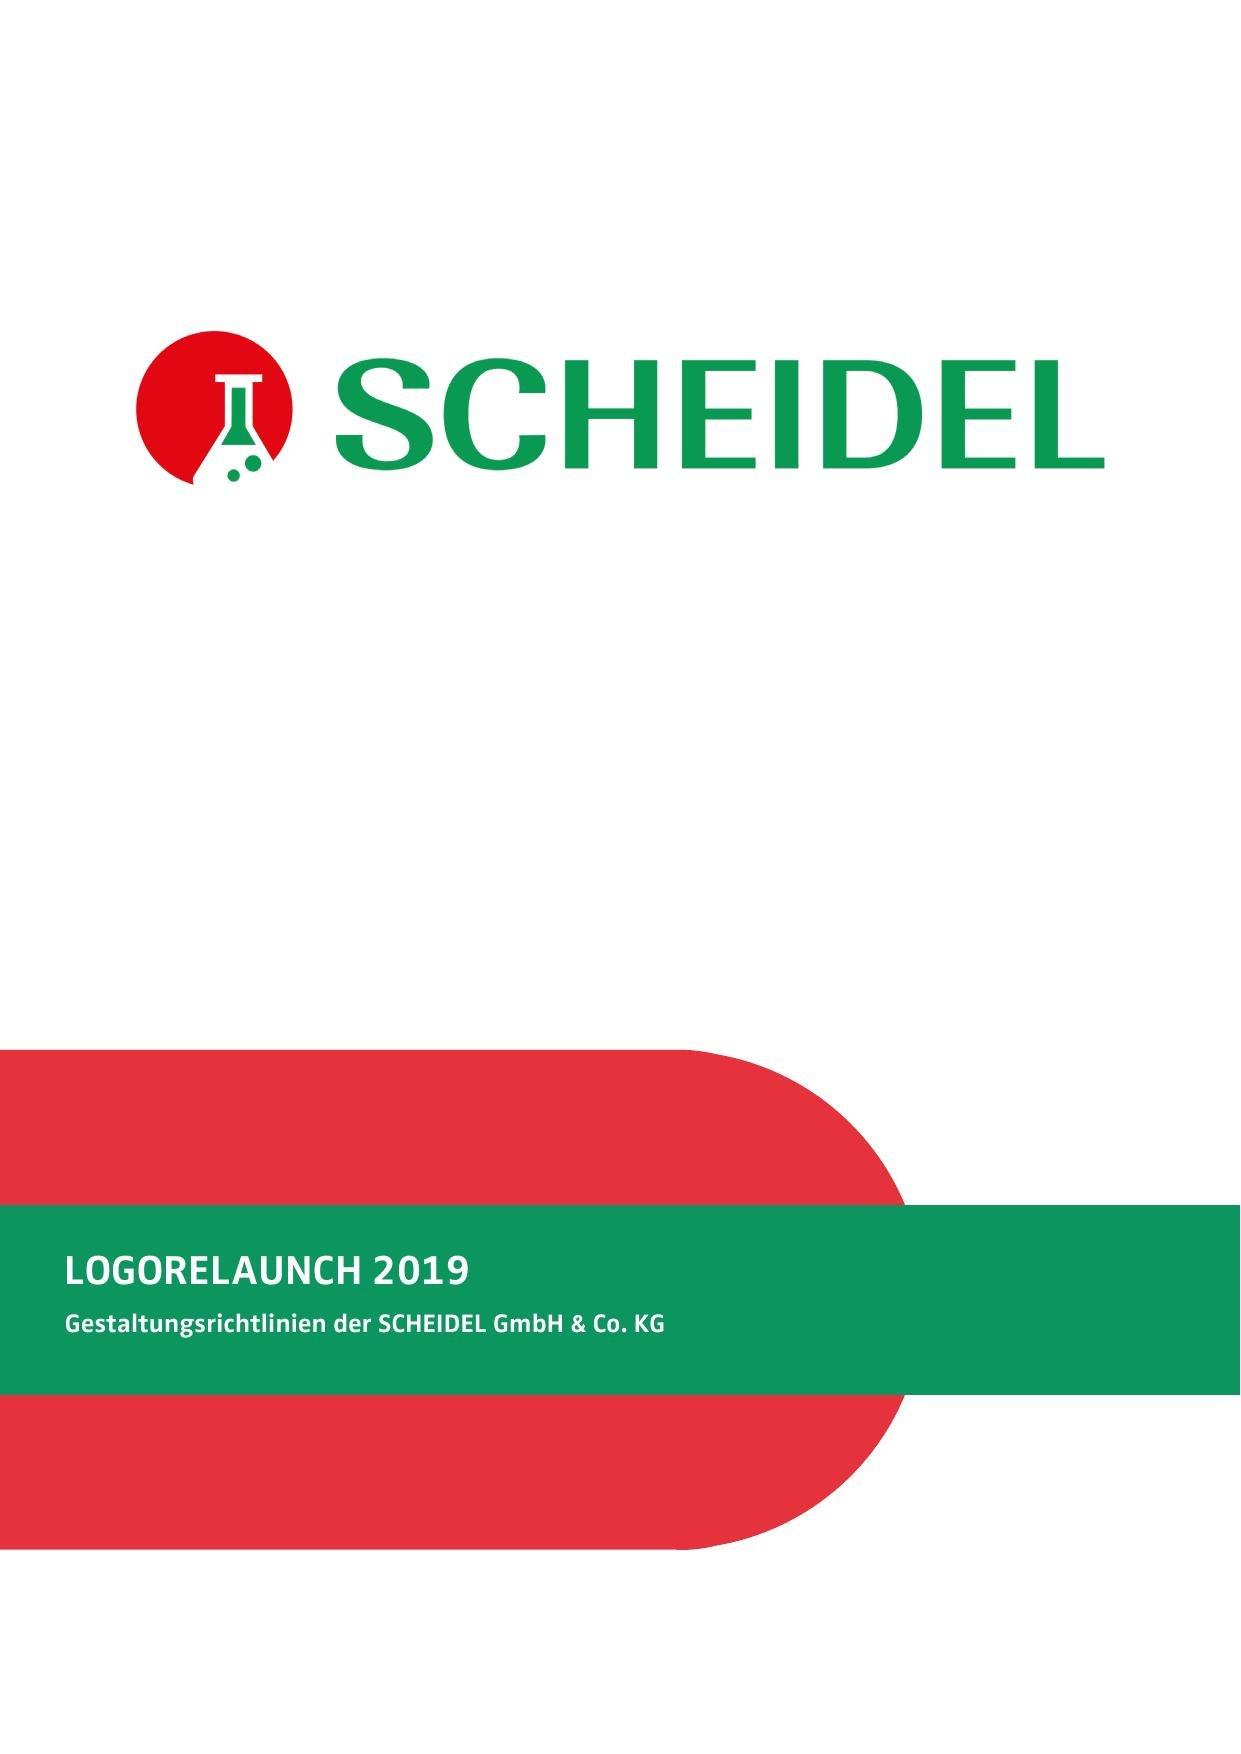 Scheidel_CD_KL1.jpg